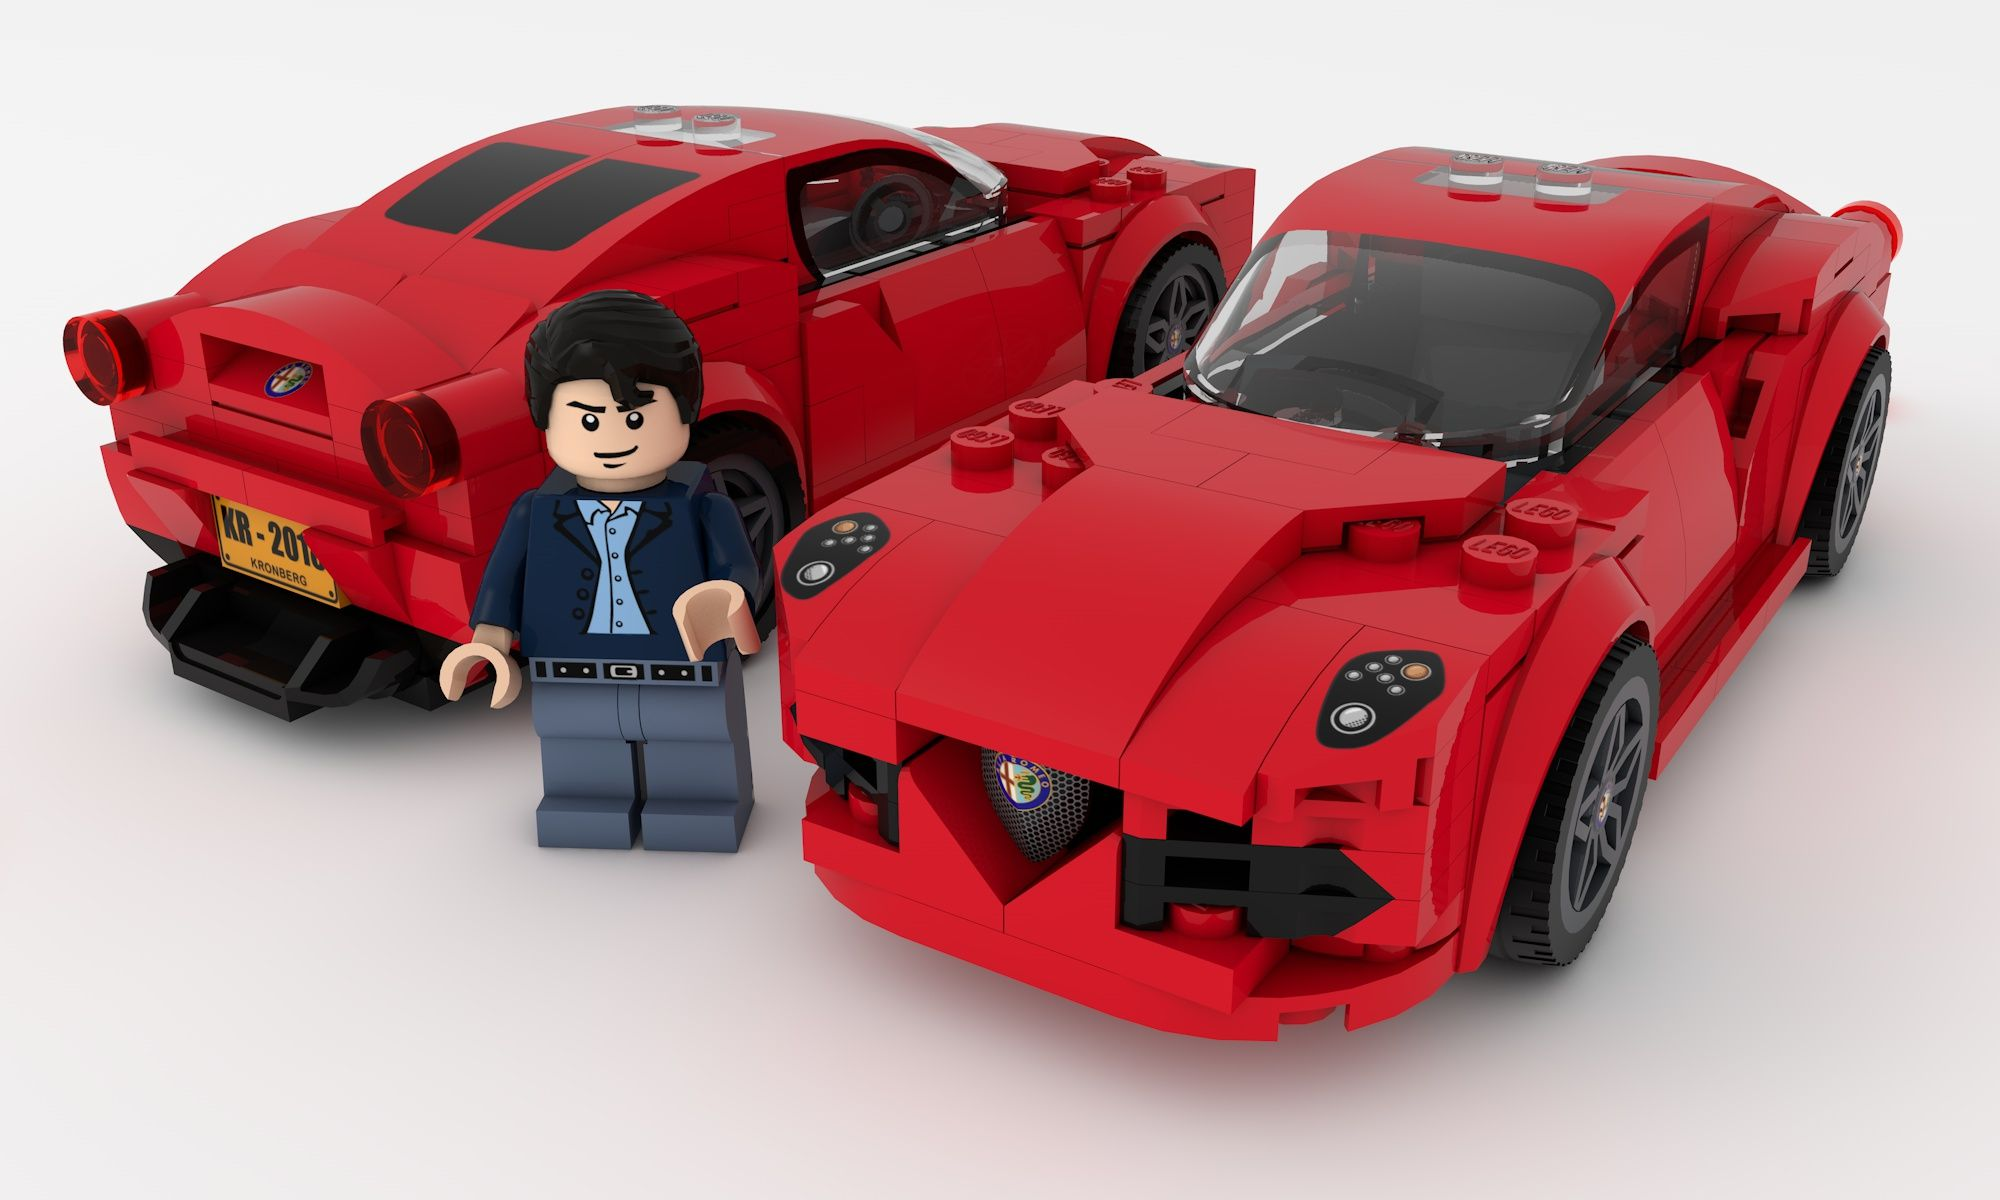 Lego Moc Alfa Romeo 4c Lego Wheels Lego Lego Cars